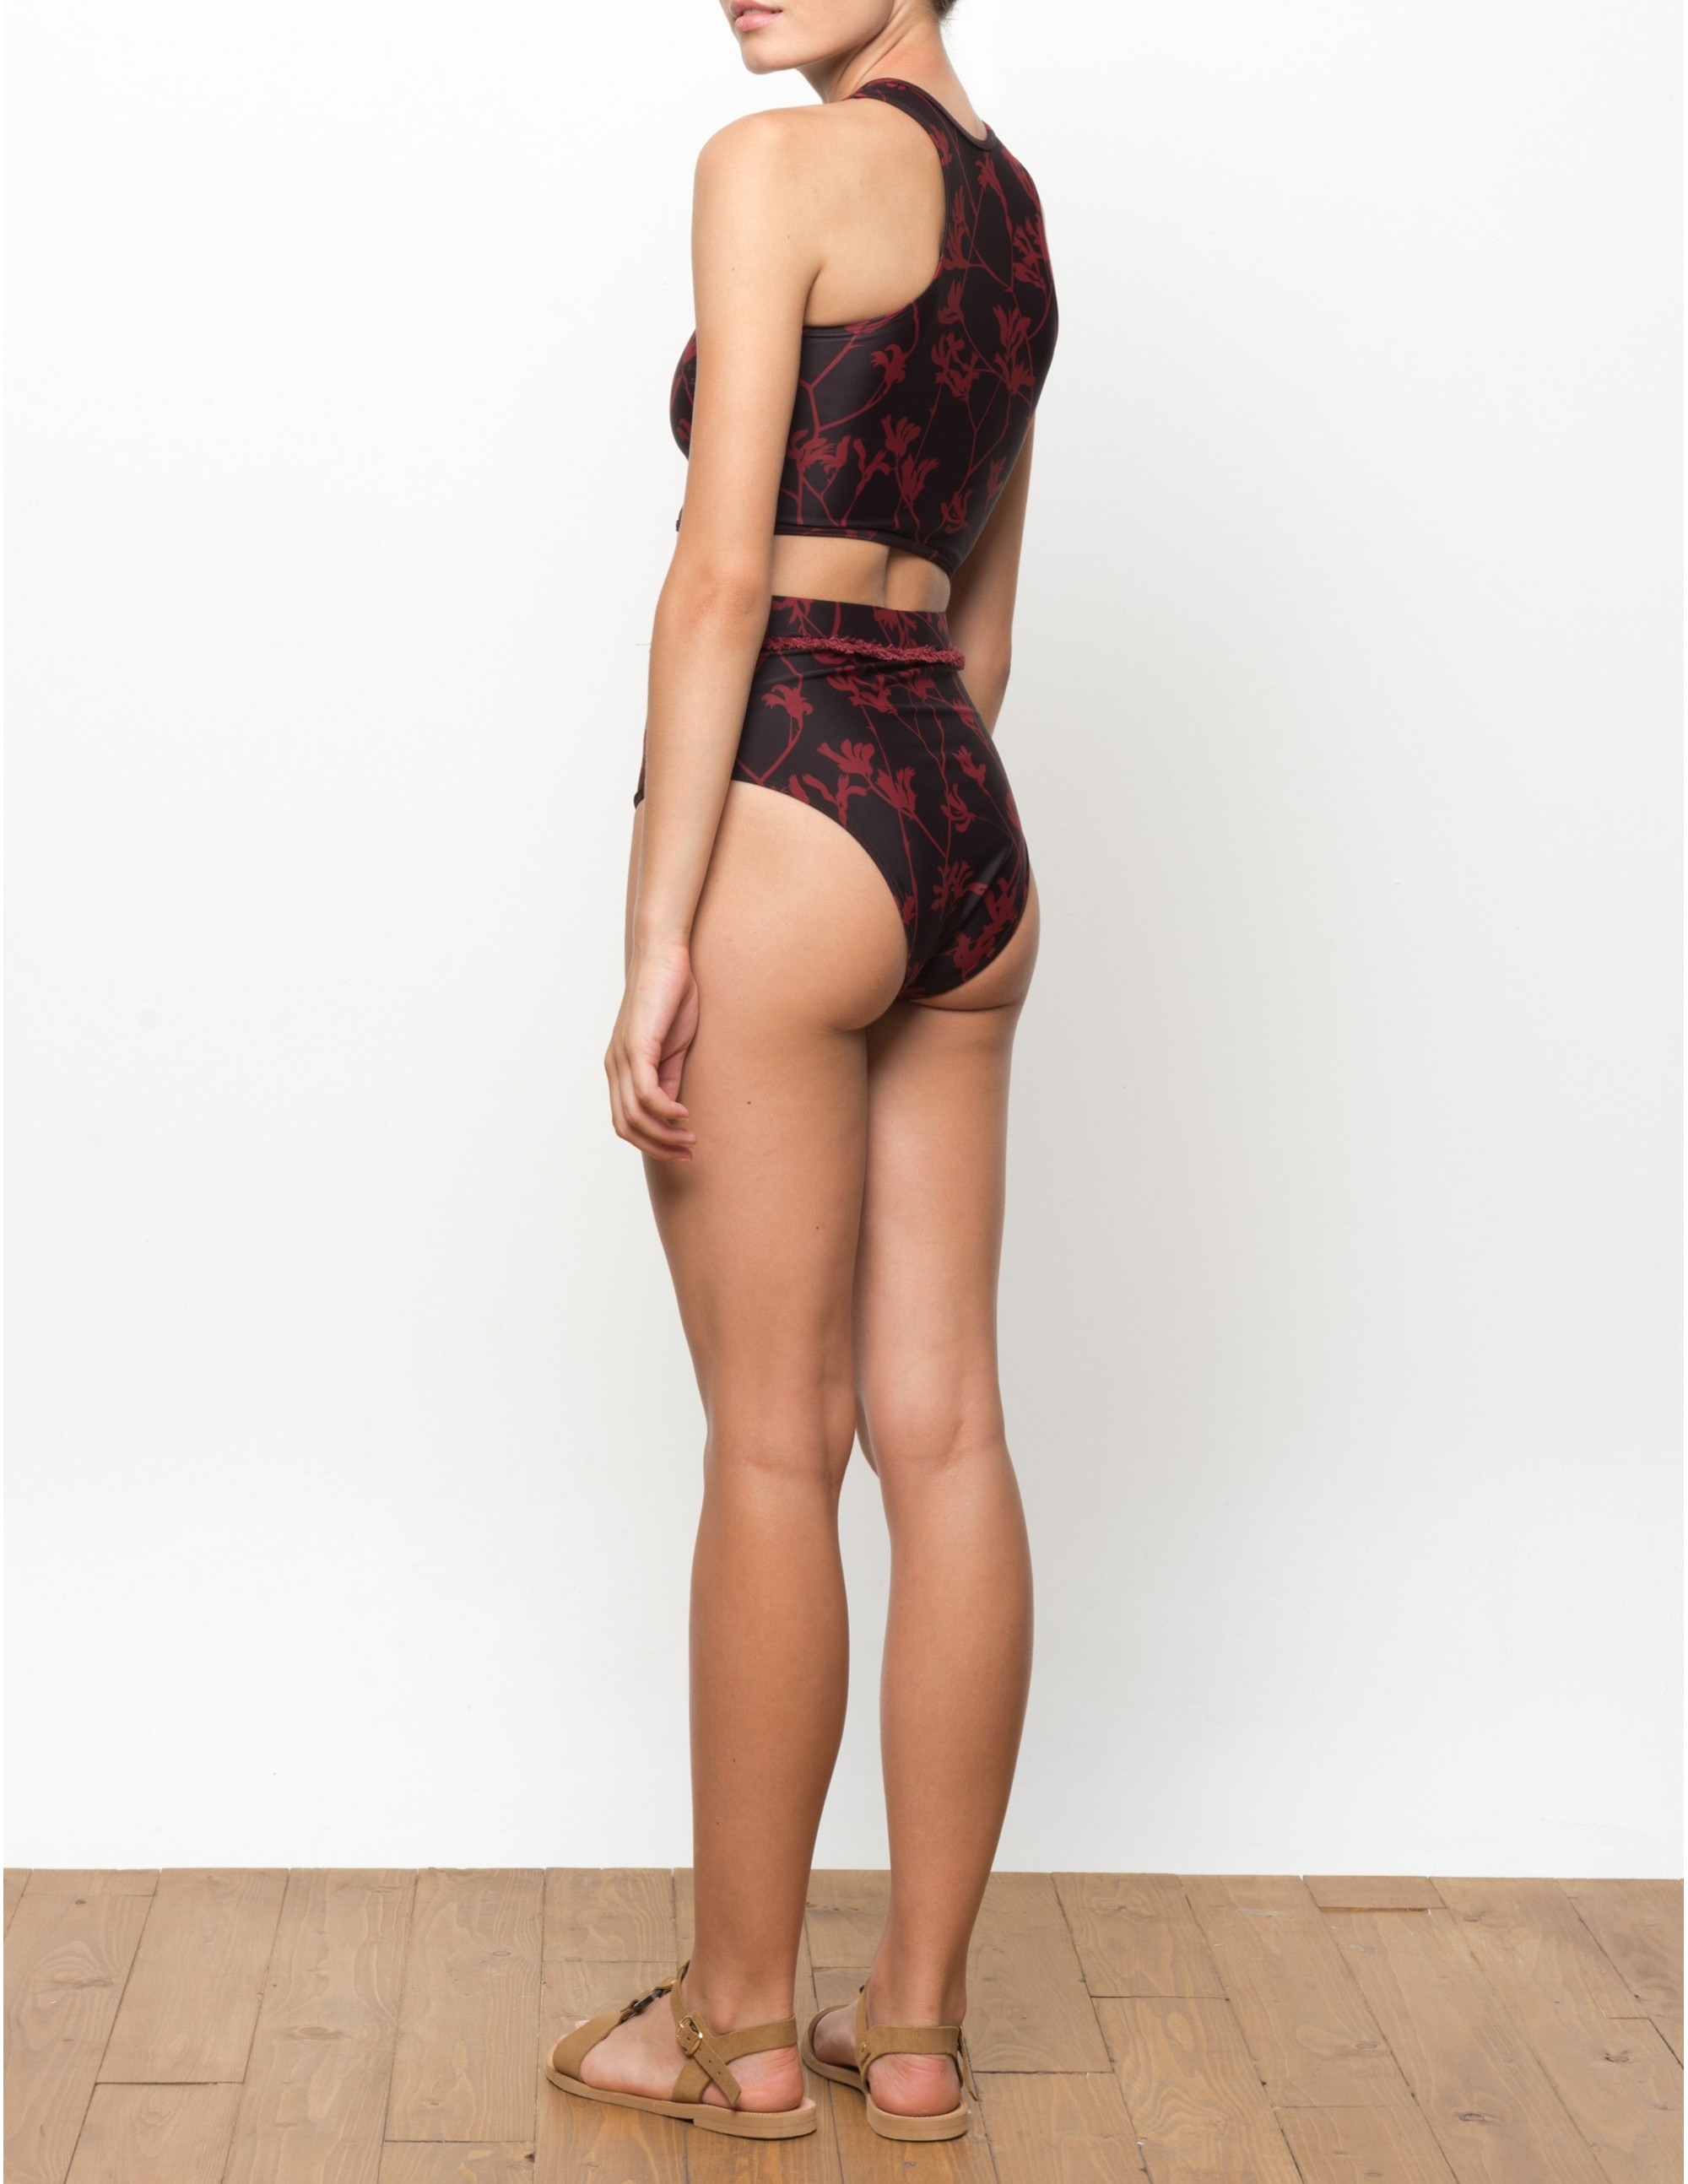 NAKU bikini top - FLAME LILLY